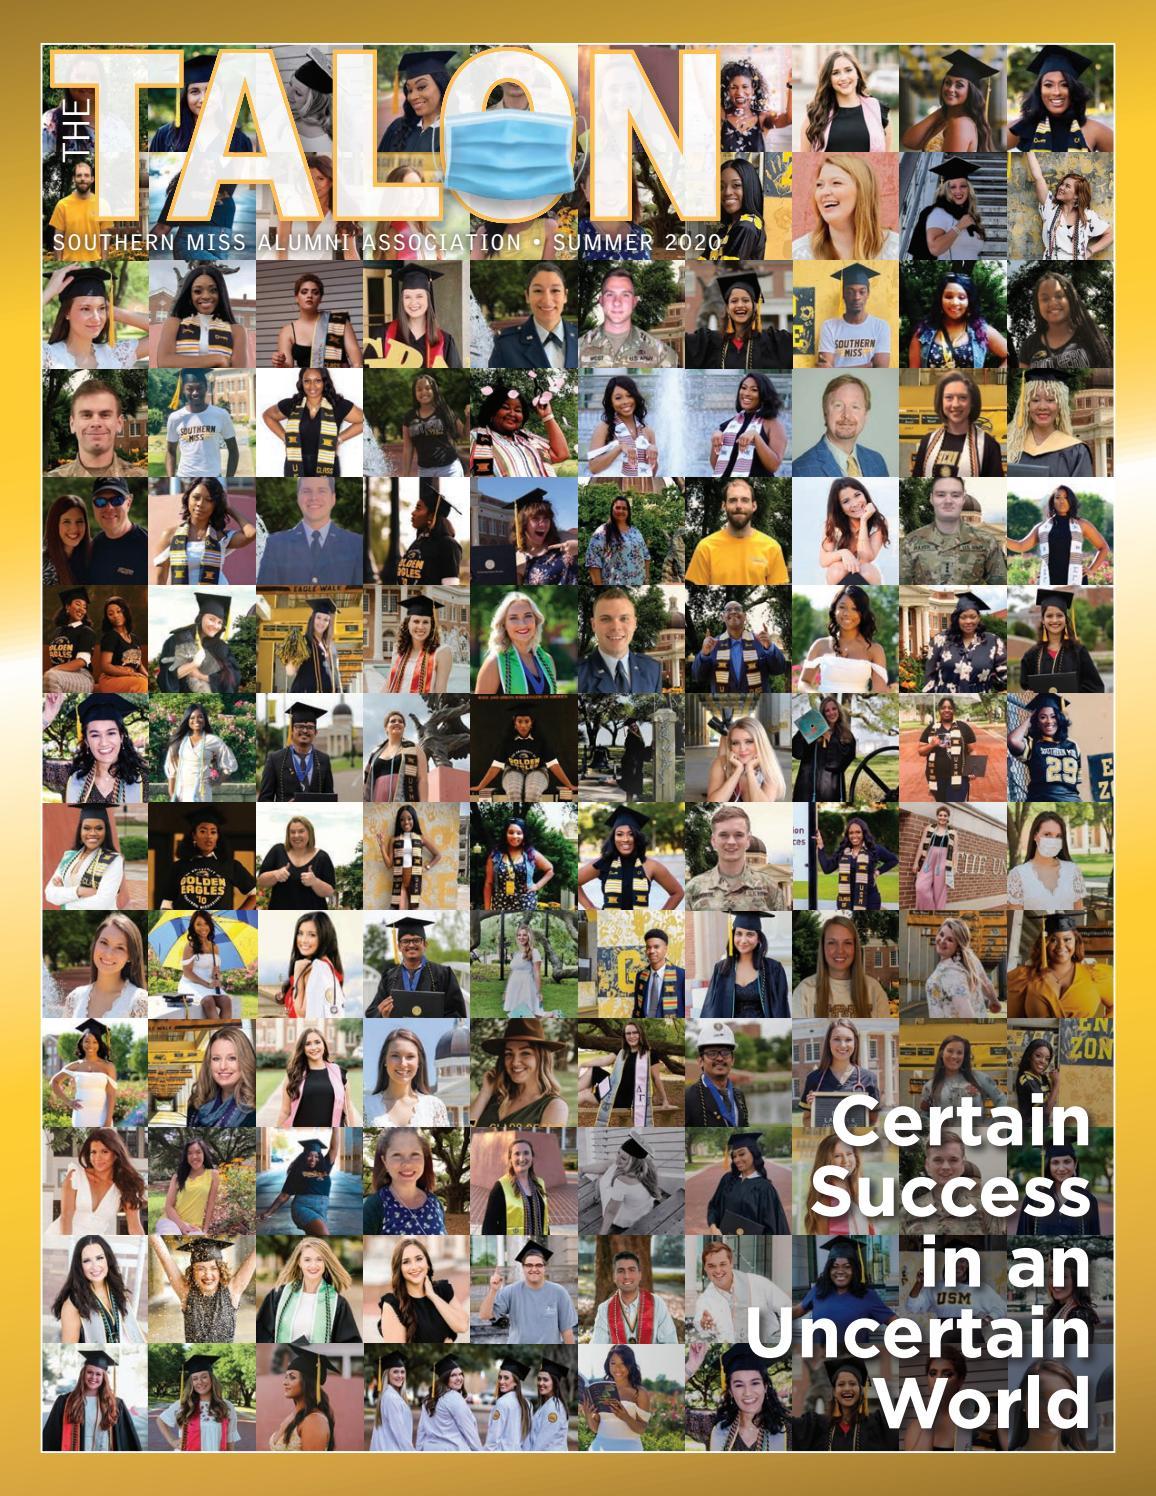 Usm Academic Calendar Fall 2022.The Talon Summer 2020 By Southern Miss Alumni Association Issuu